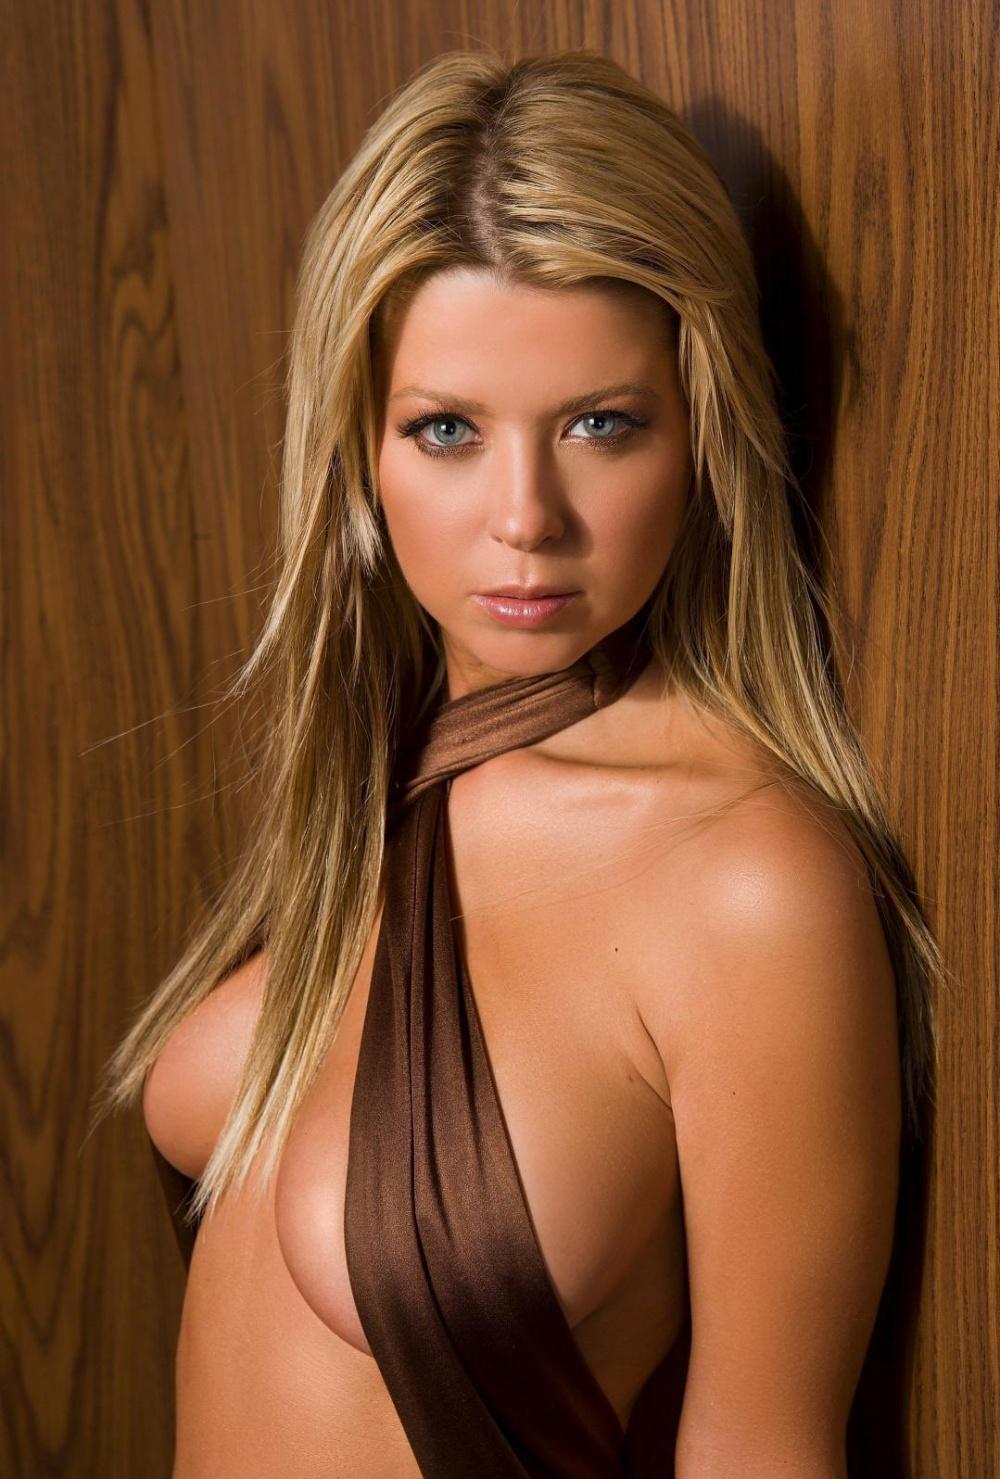 Tara reid nude porn pics leaked, xxx sex photos